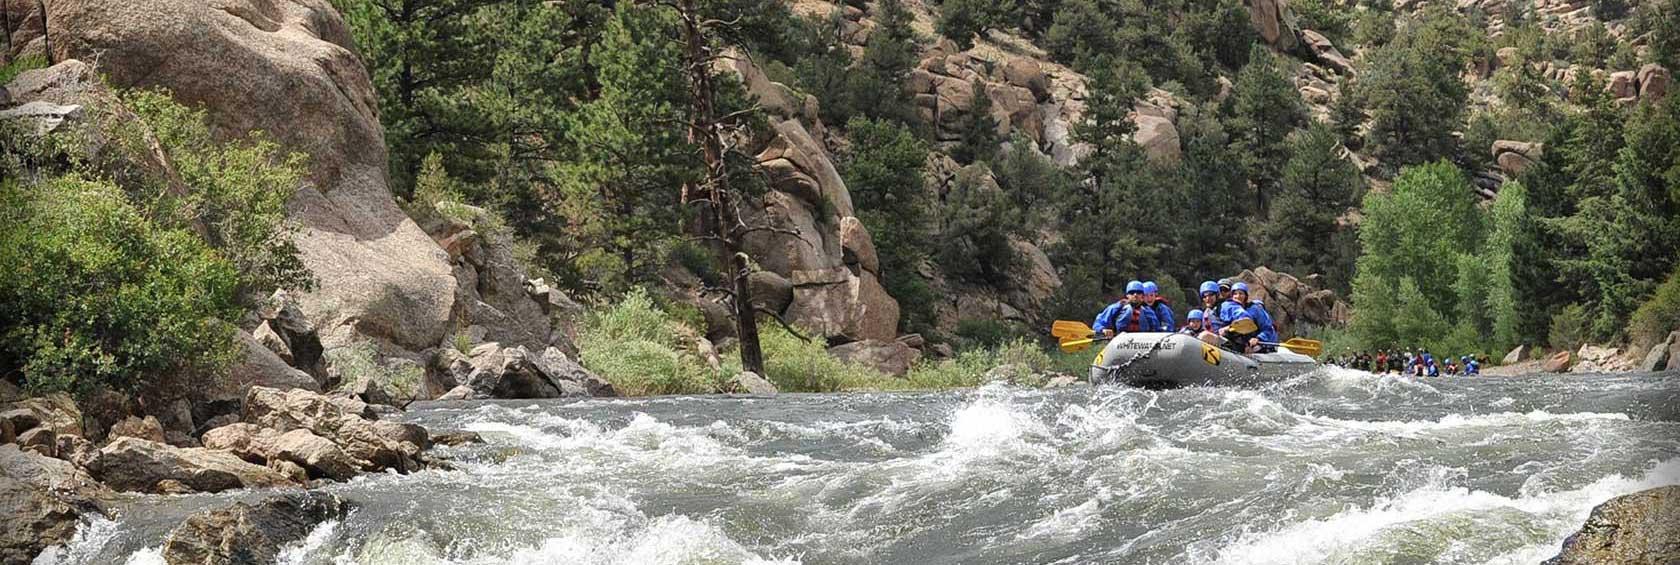 rafting-slider